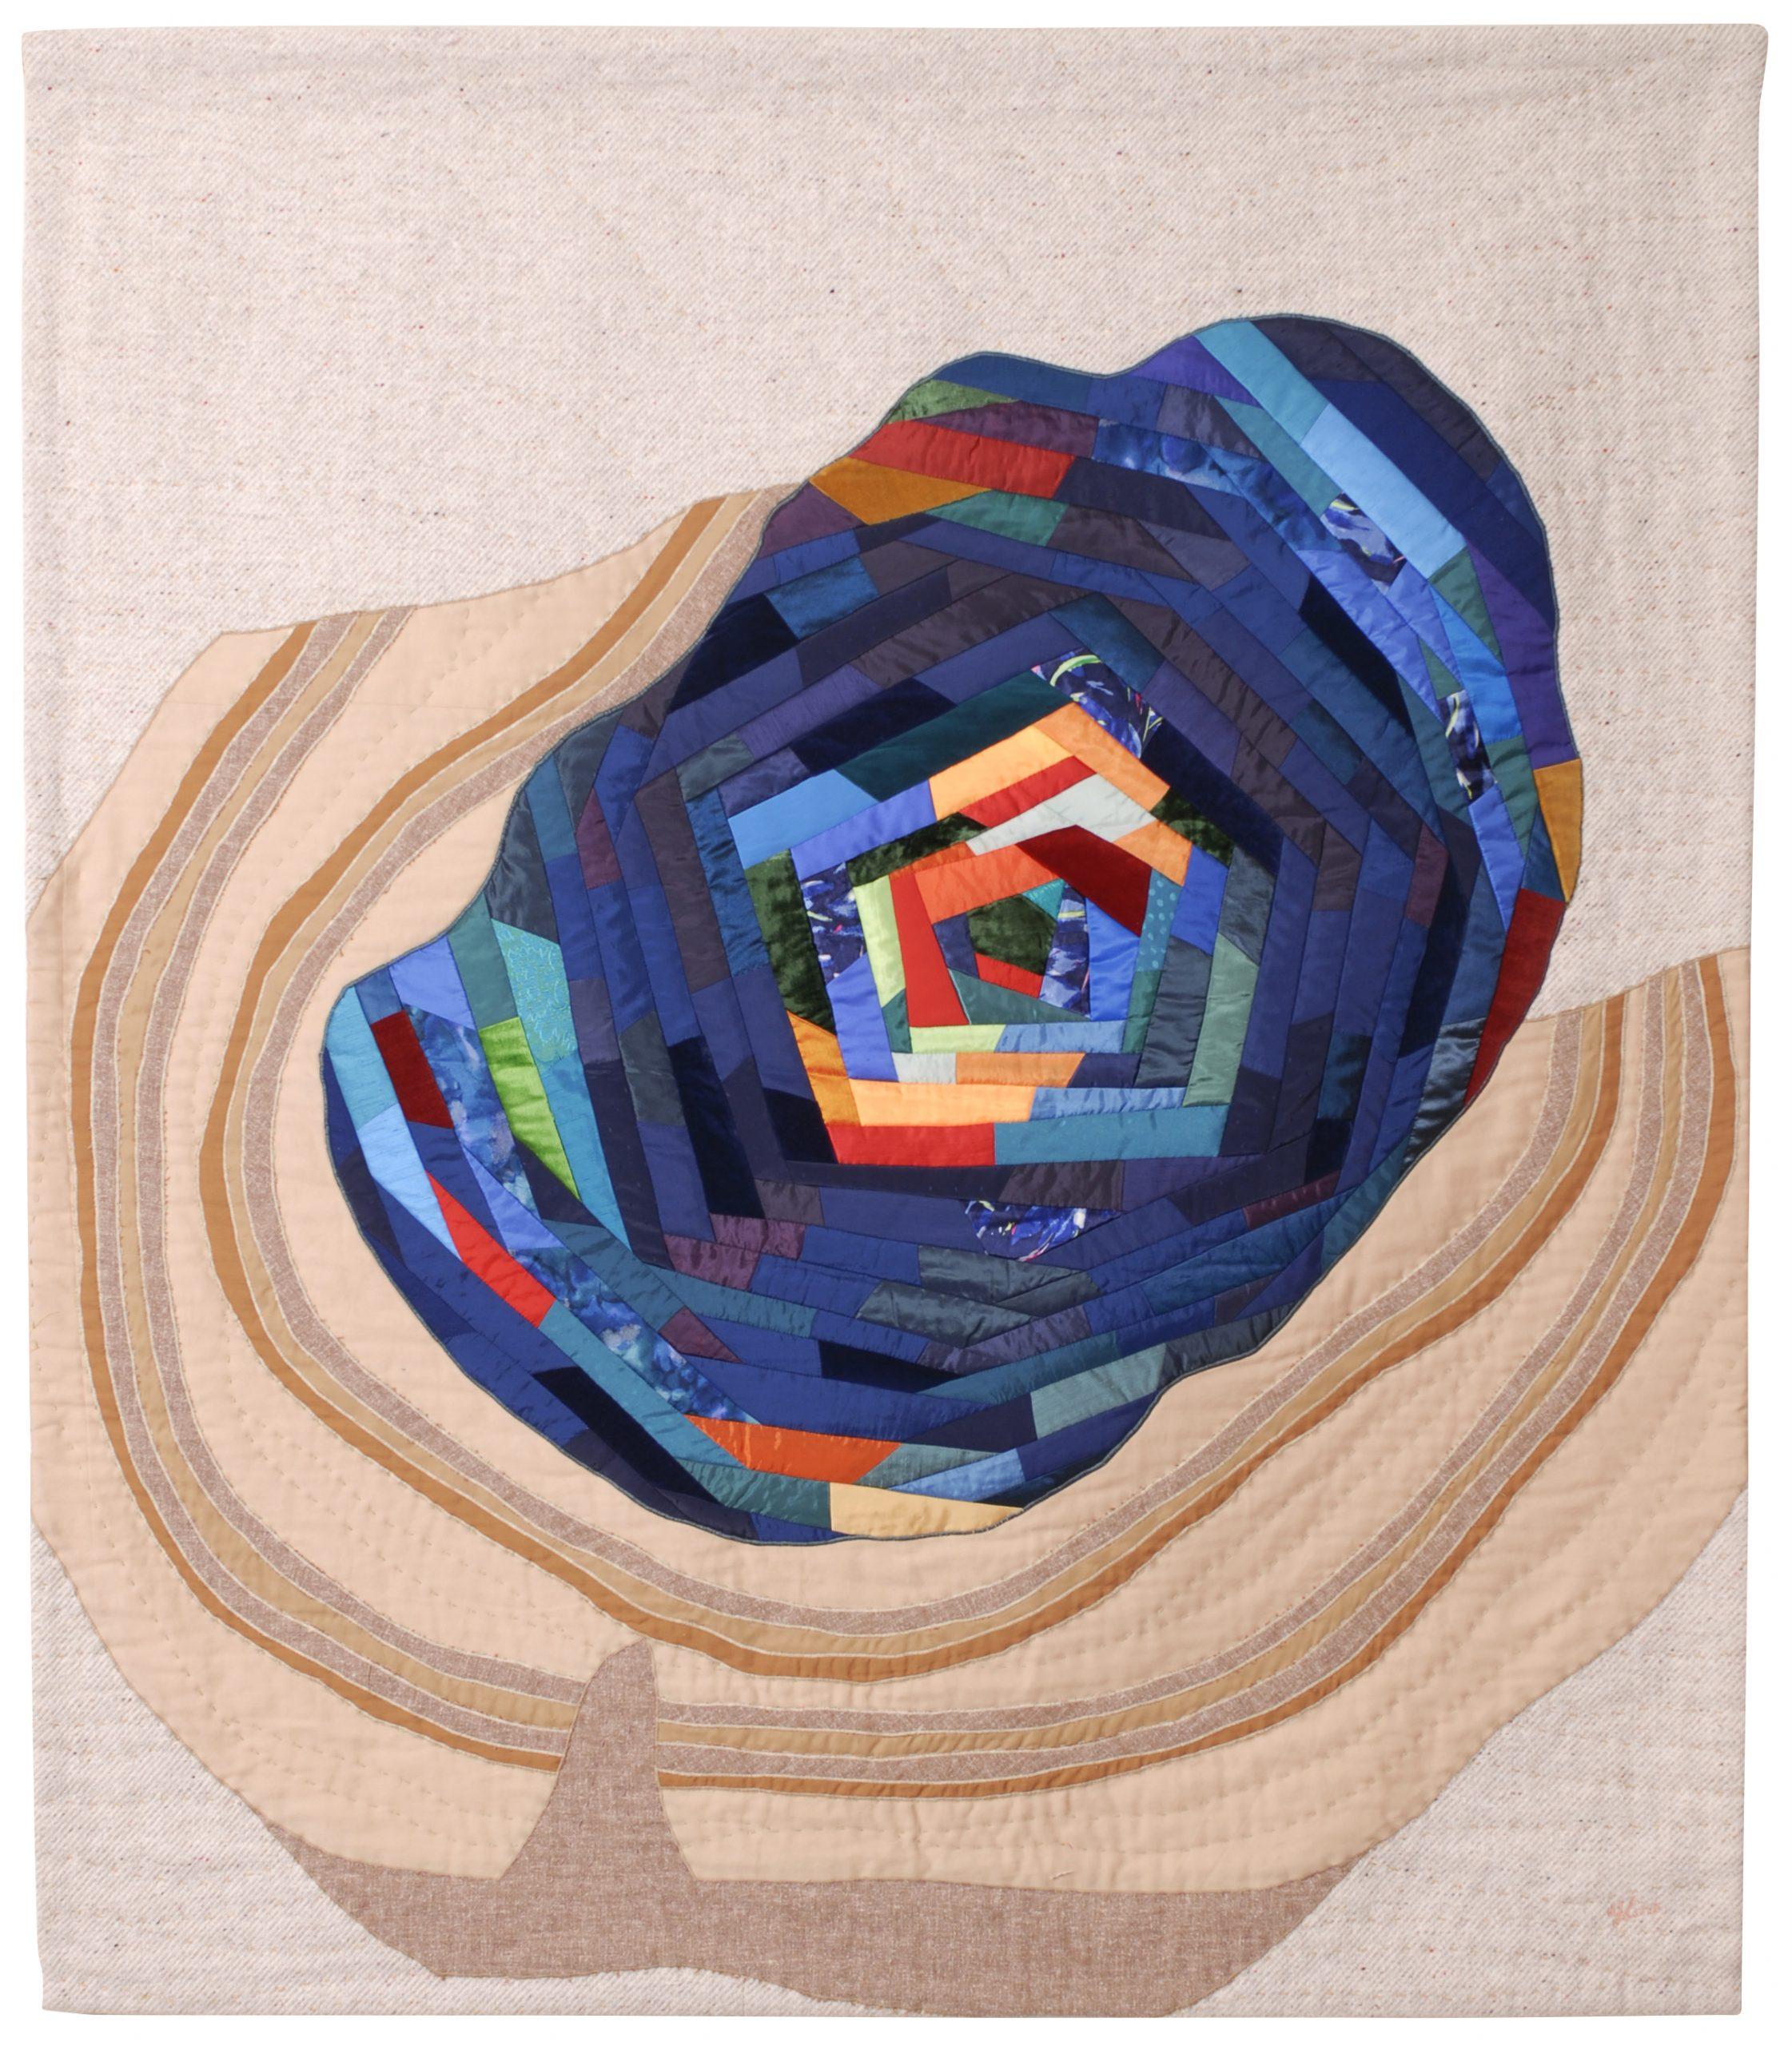 Boulders Opal 2 (1988) 128cm H x 156cm W